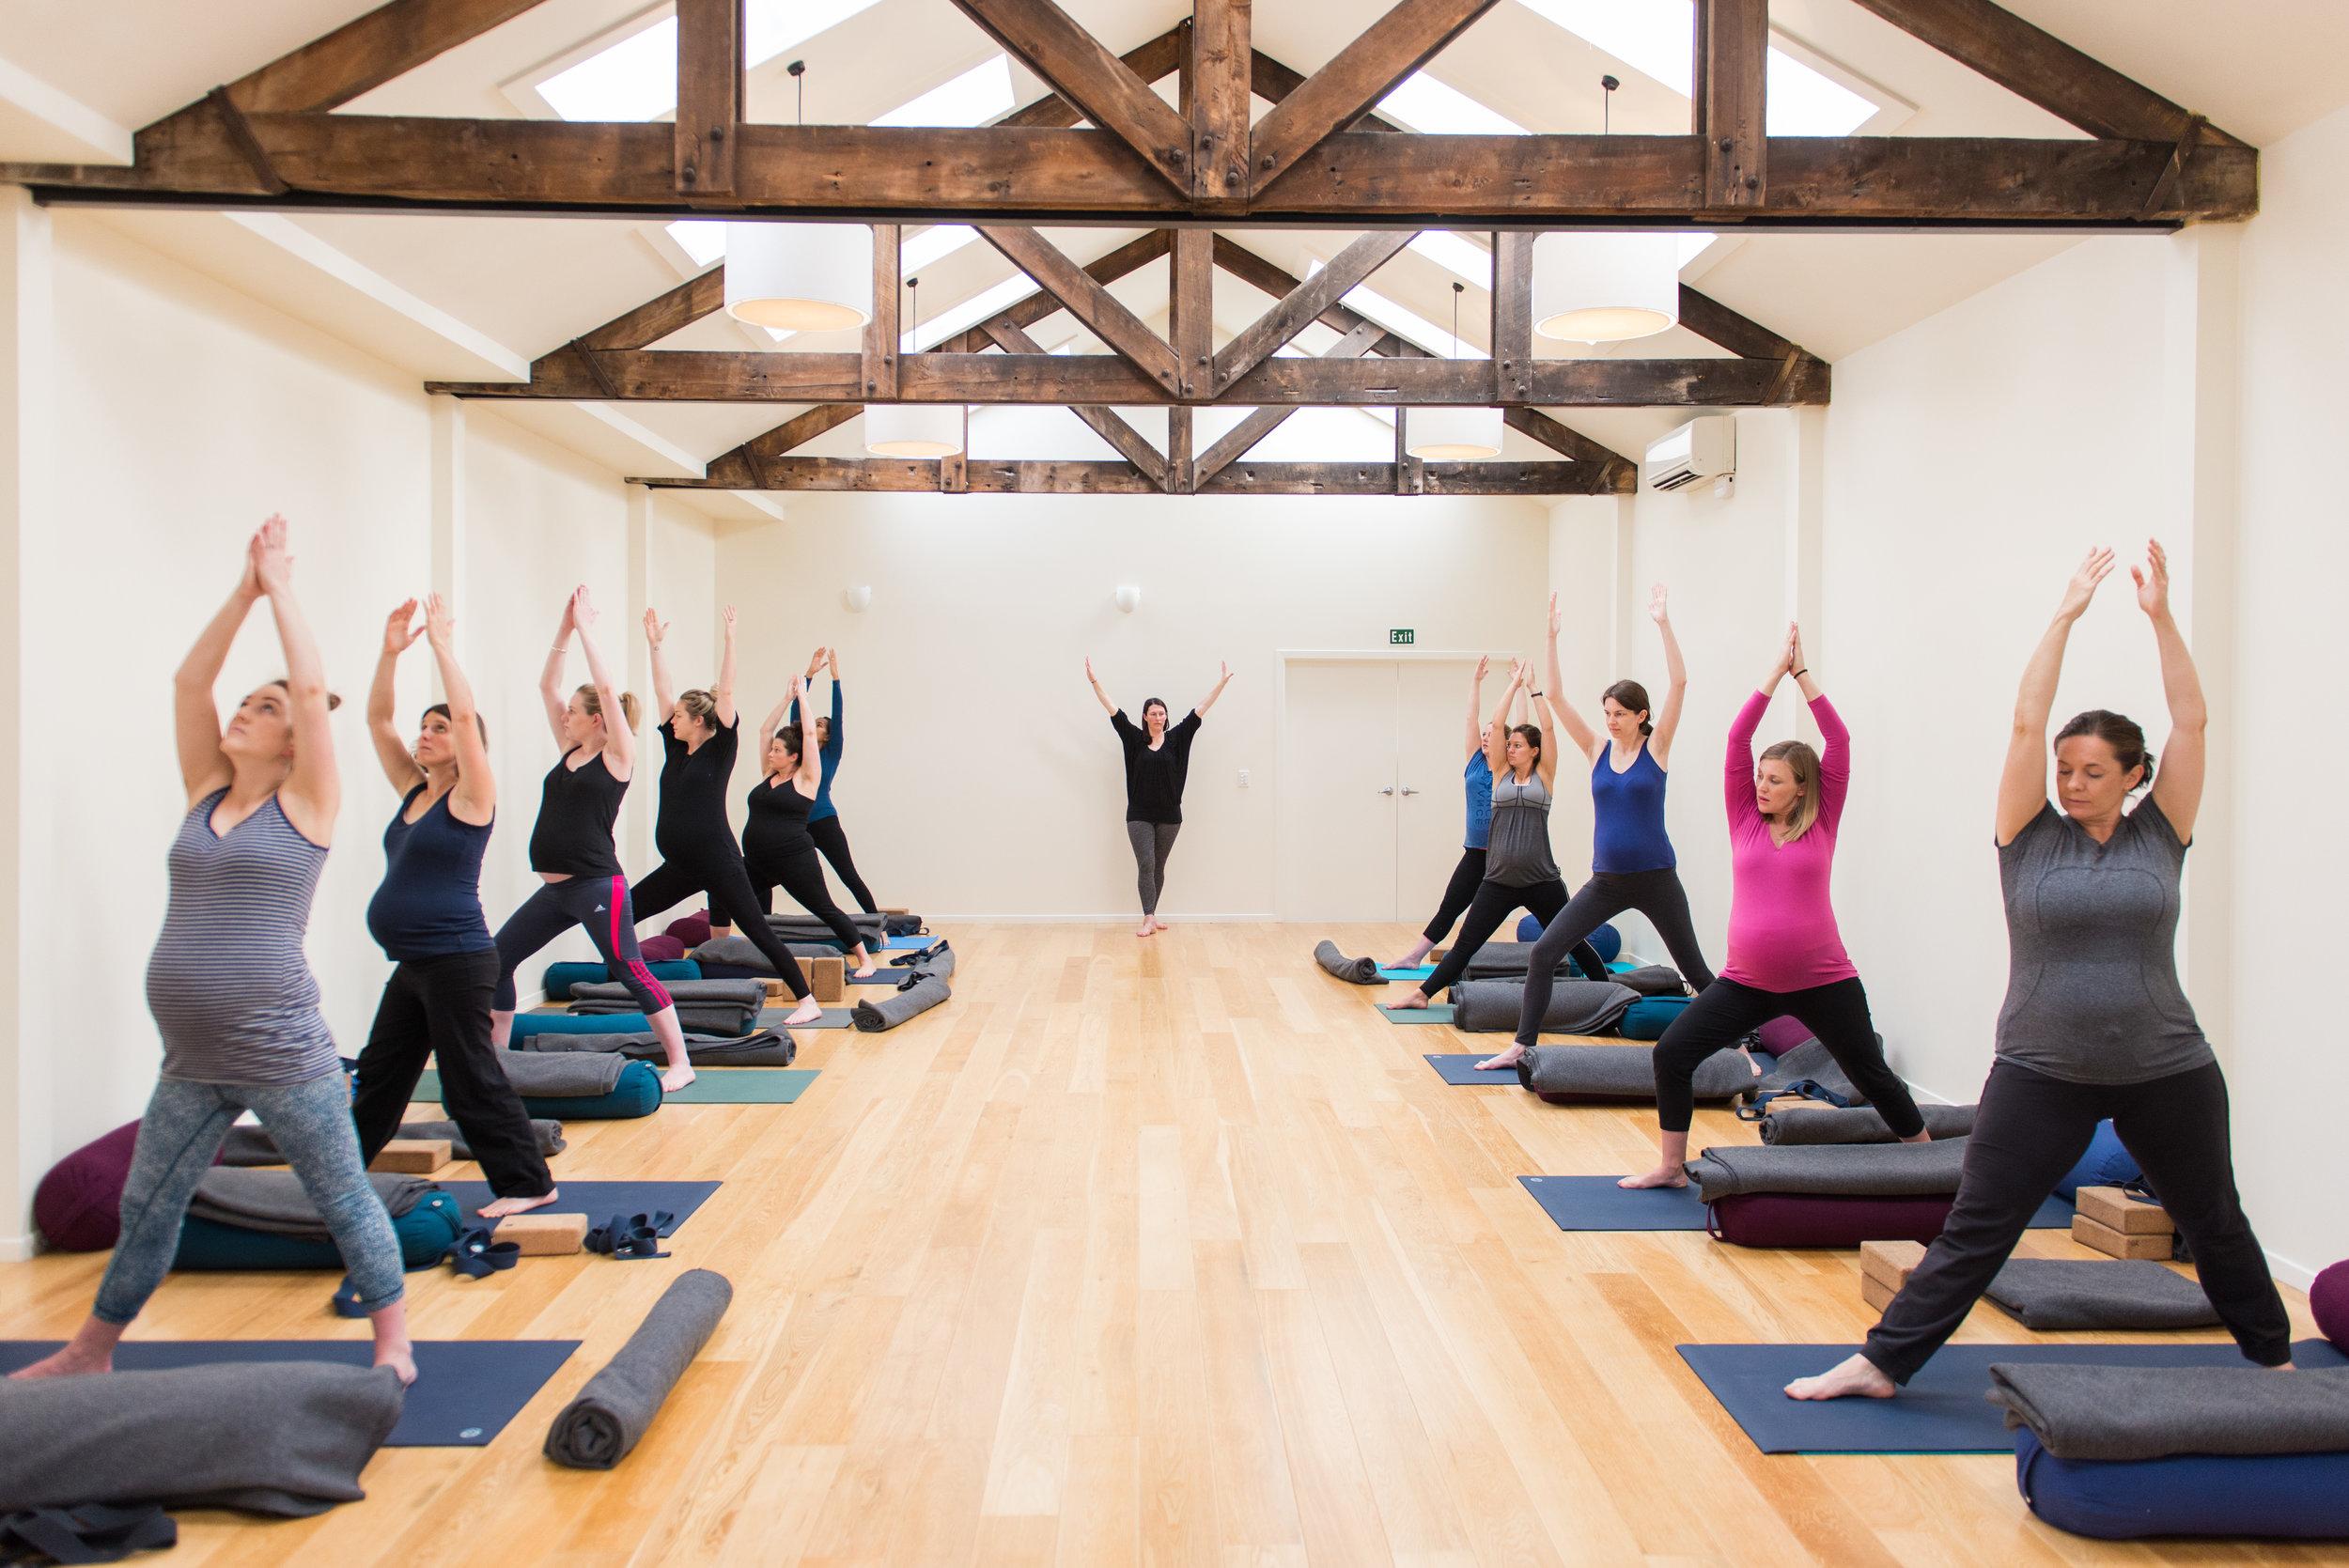 Grassroots Yoga Studio